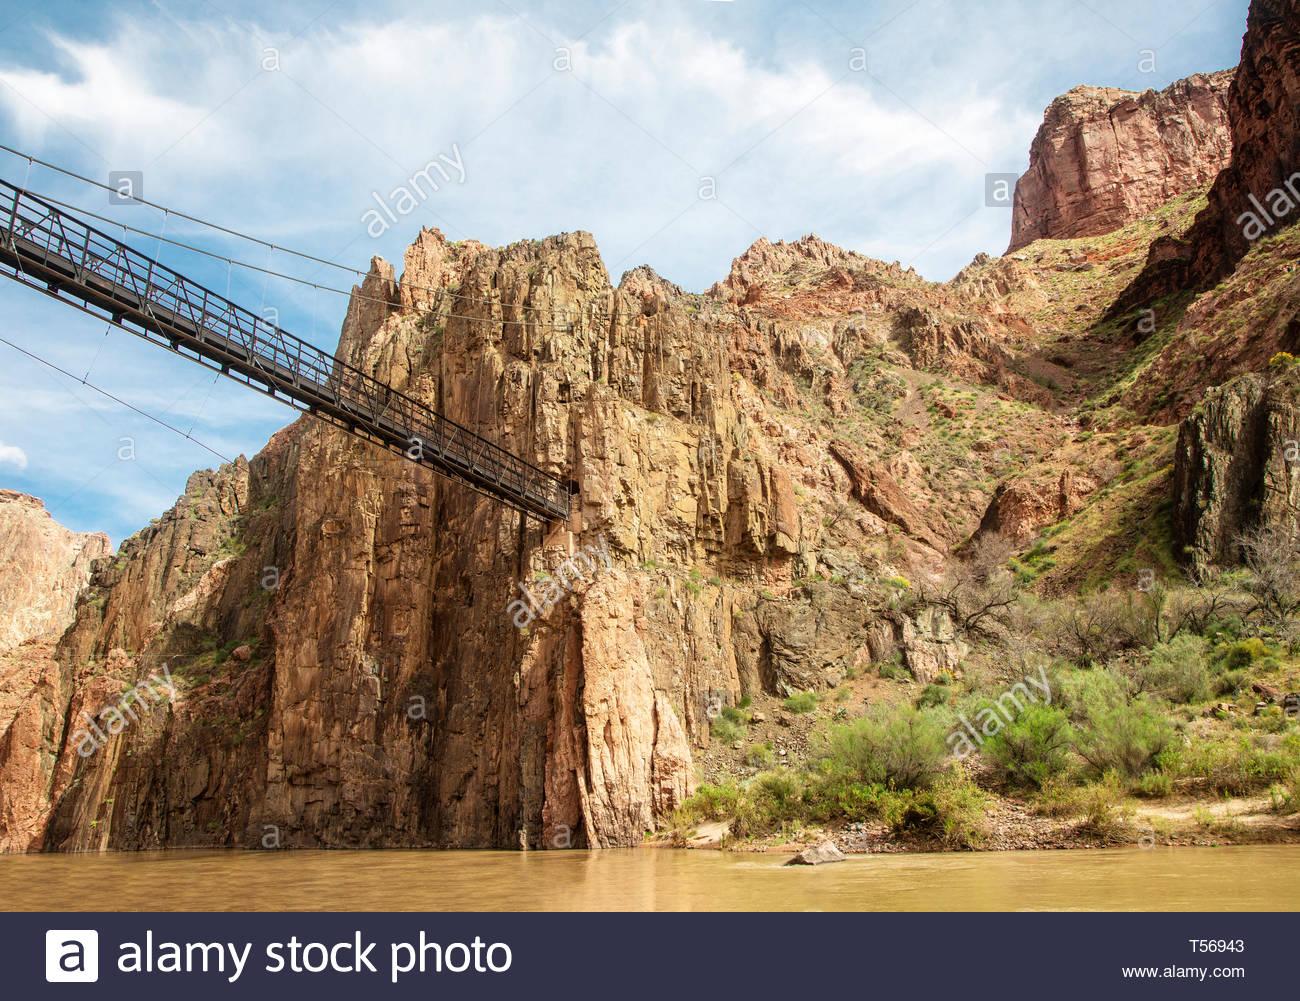 The Kaibab Suspension Bridge crosses the Colorado River in the Grand Canyon basin near Phantom Ranch in Arizona. - Stock Image